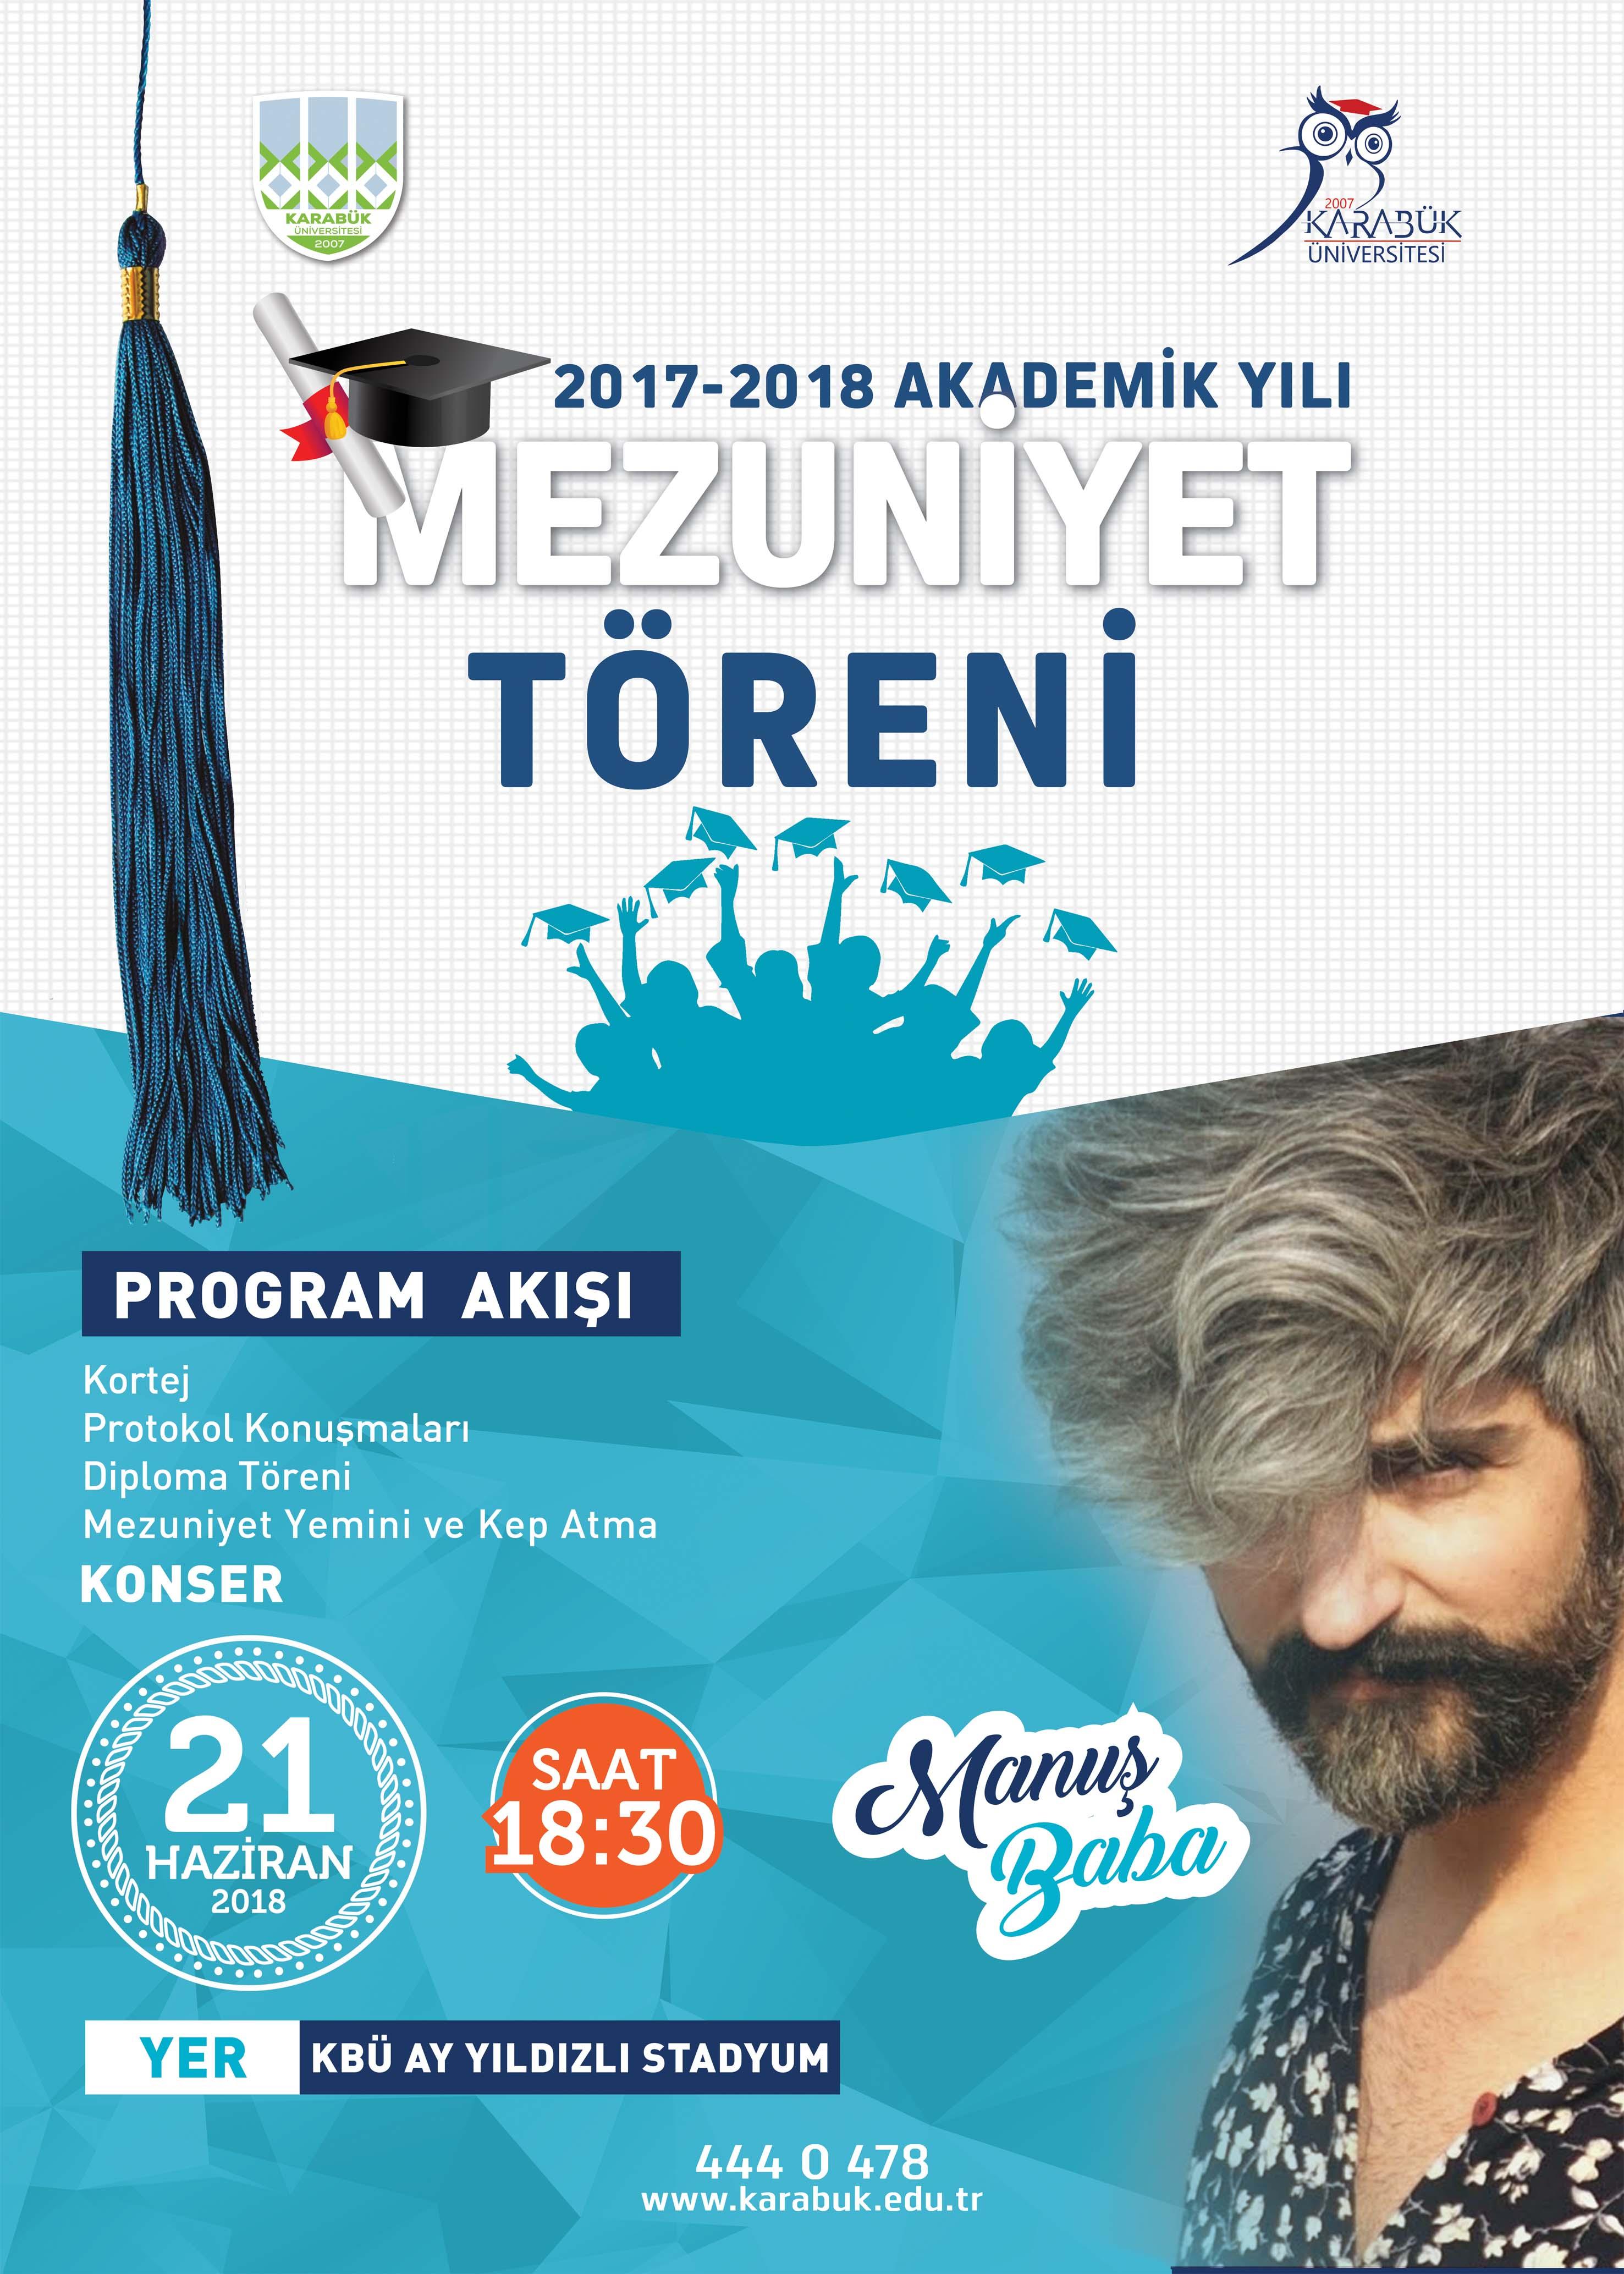 https://www.karabuk.edu.tr/popuptaslak/mezuniyet.jpg